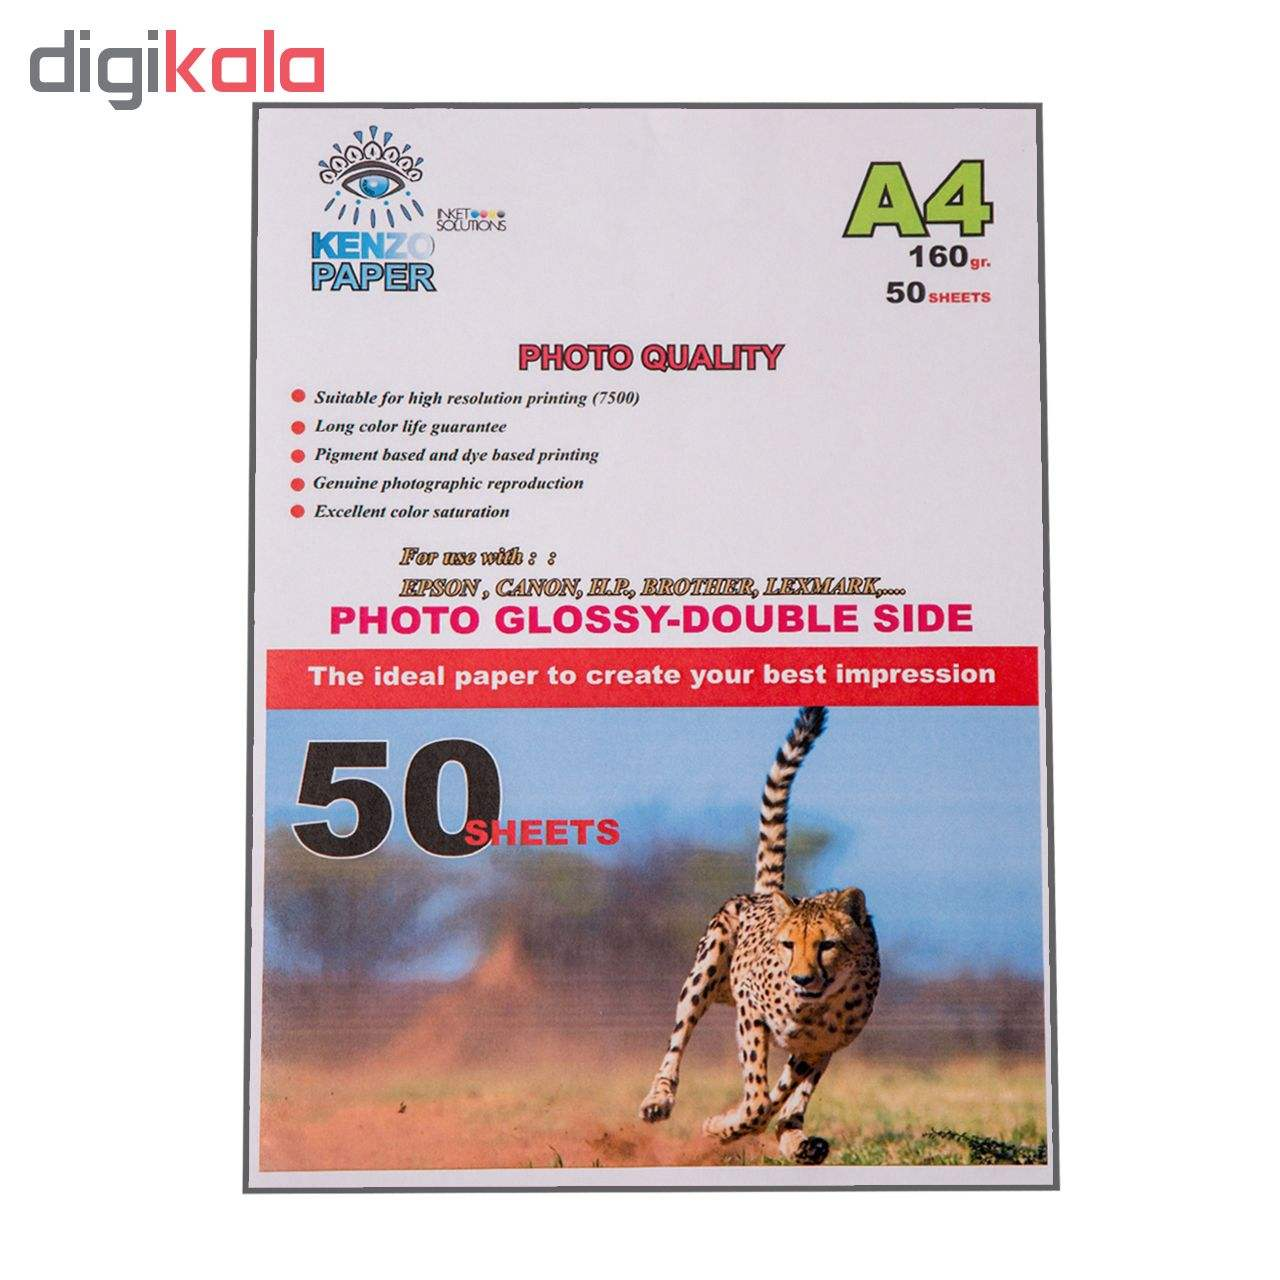 کاغذ چاپ عکس فتوگلاسه کنزو مدل k160_pgd سایز A4 بسته 50 عددی main 1 1